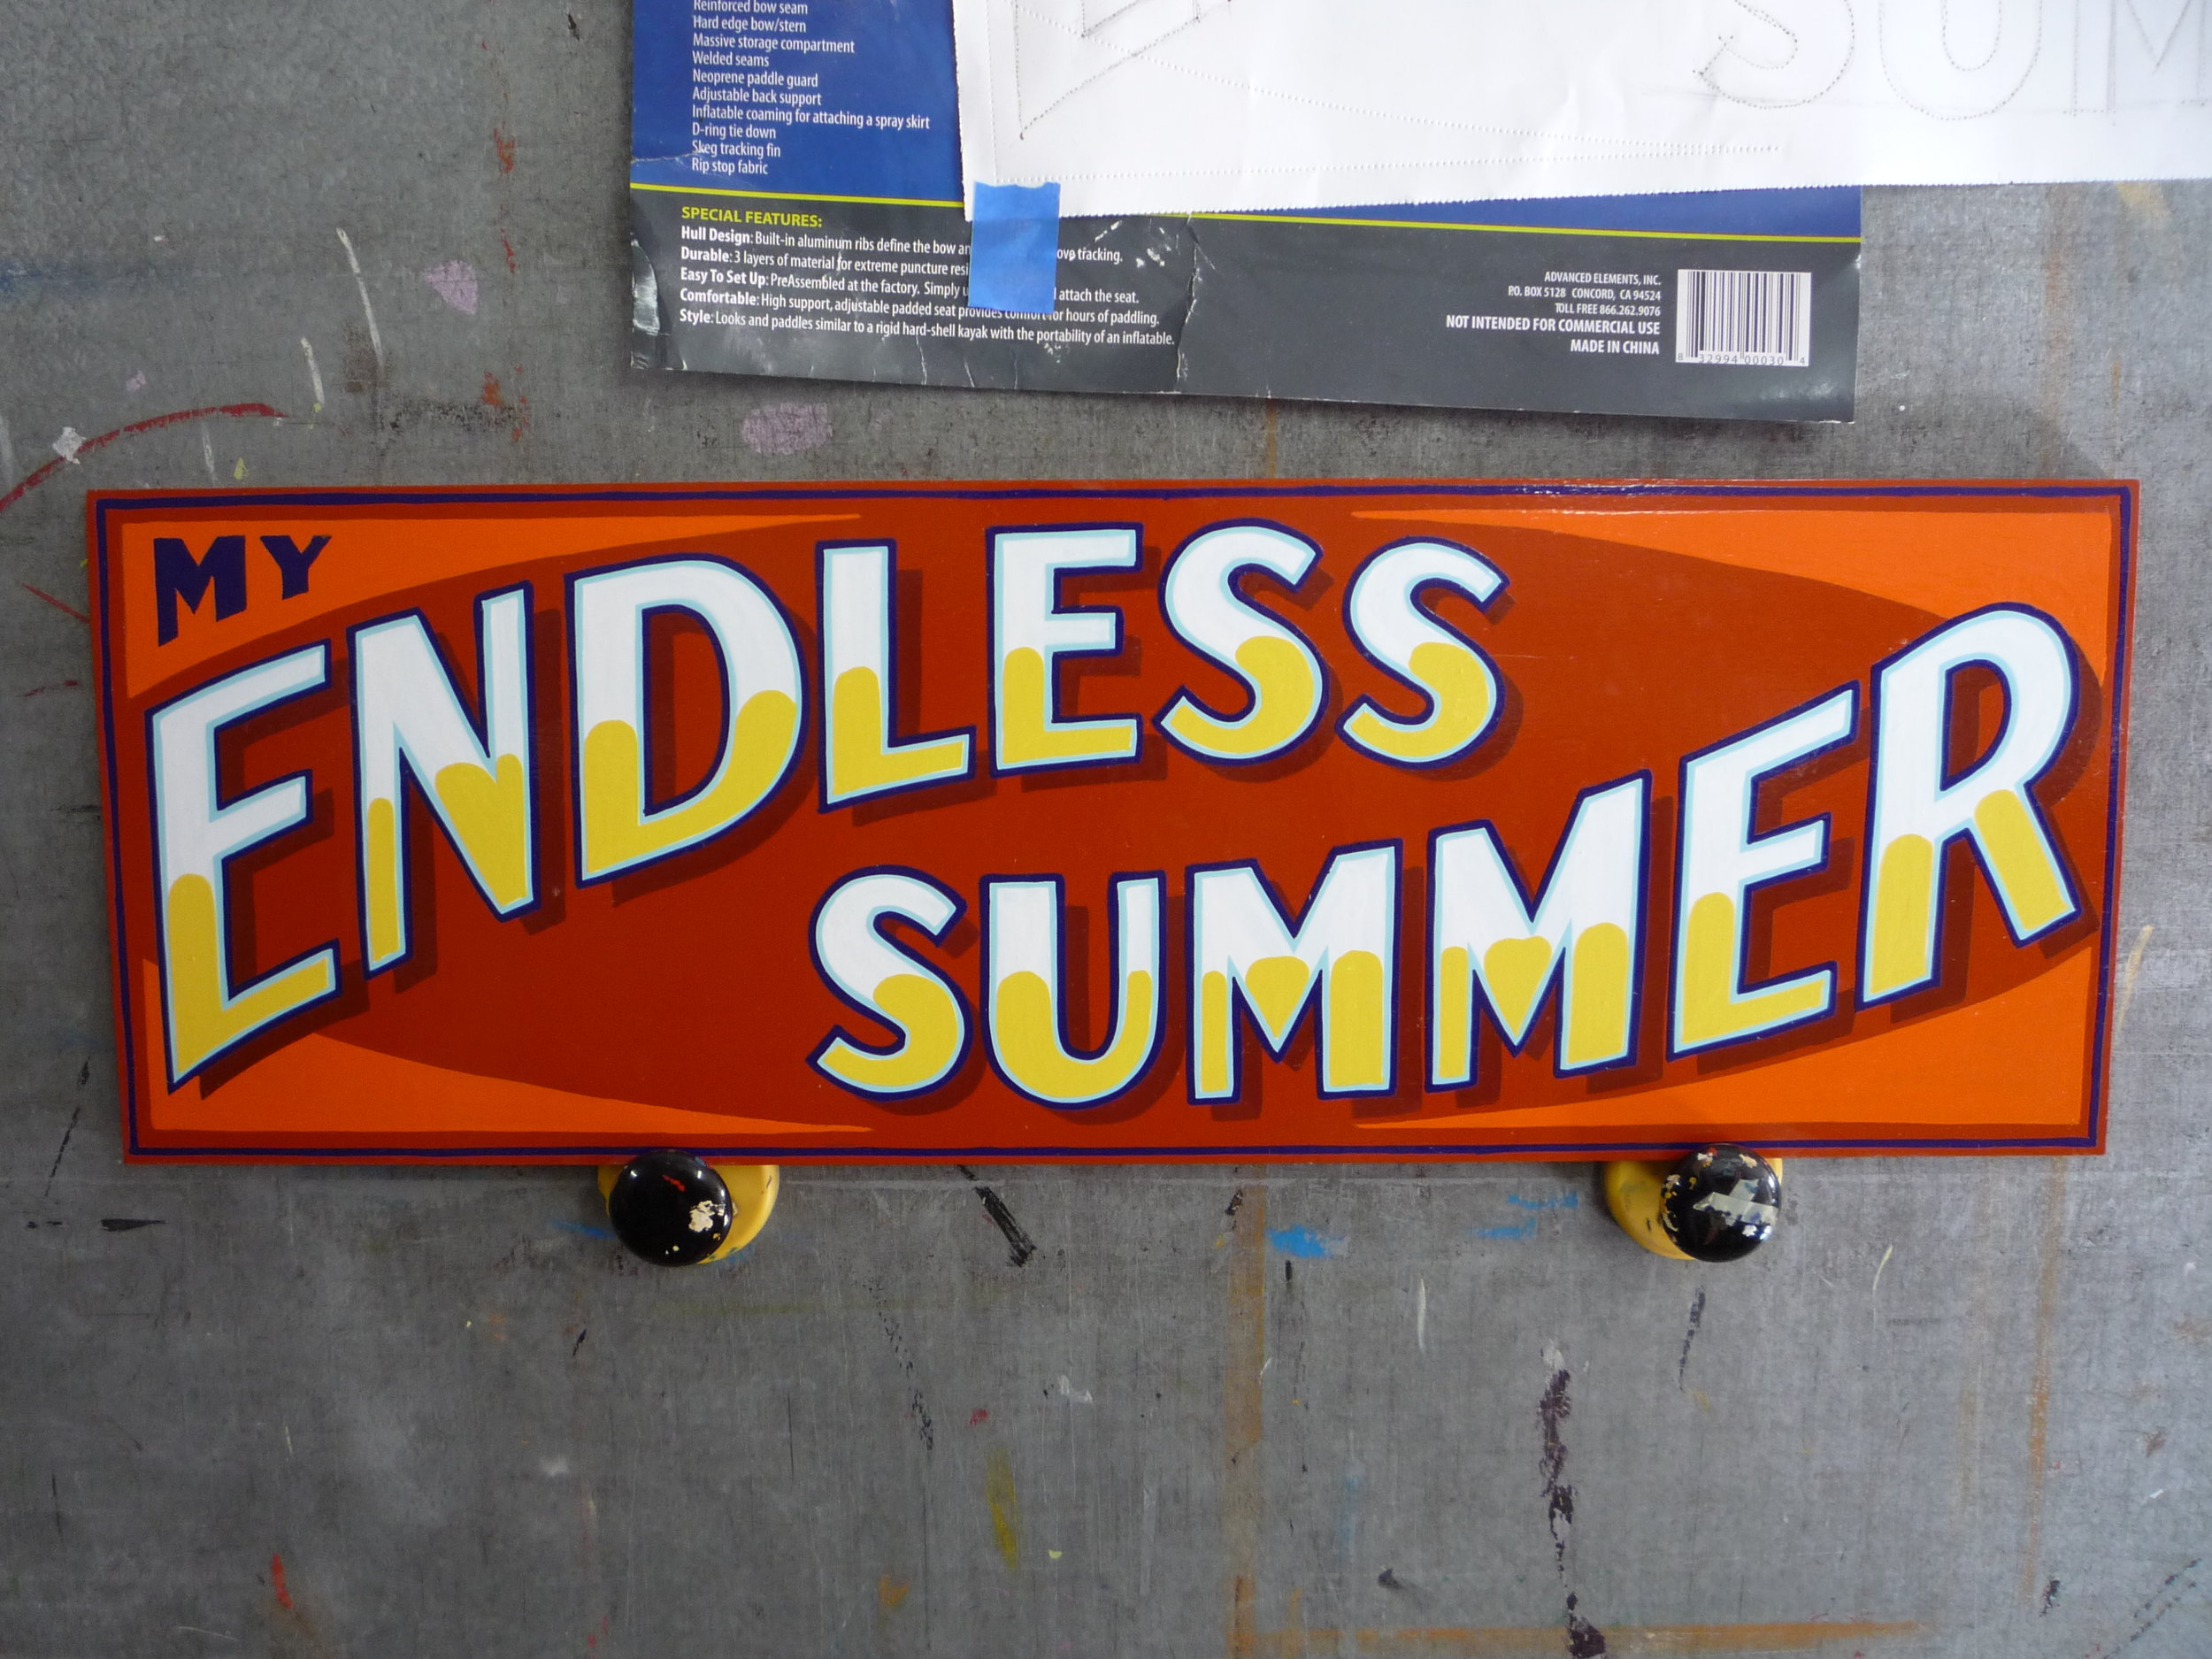 ORIG-my-endless-summer_4307281558_o.jpg